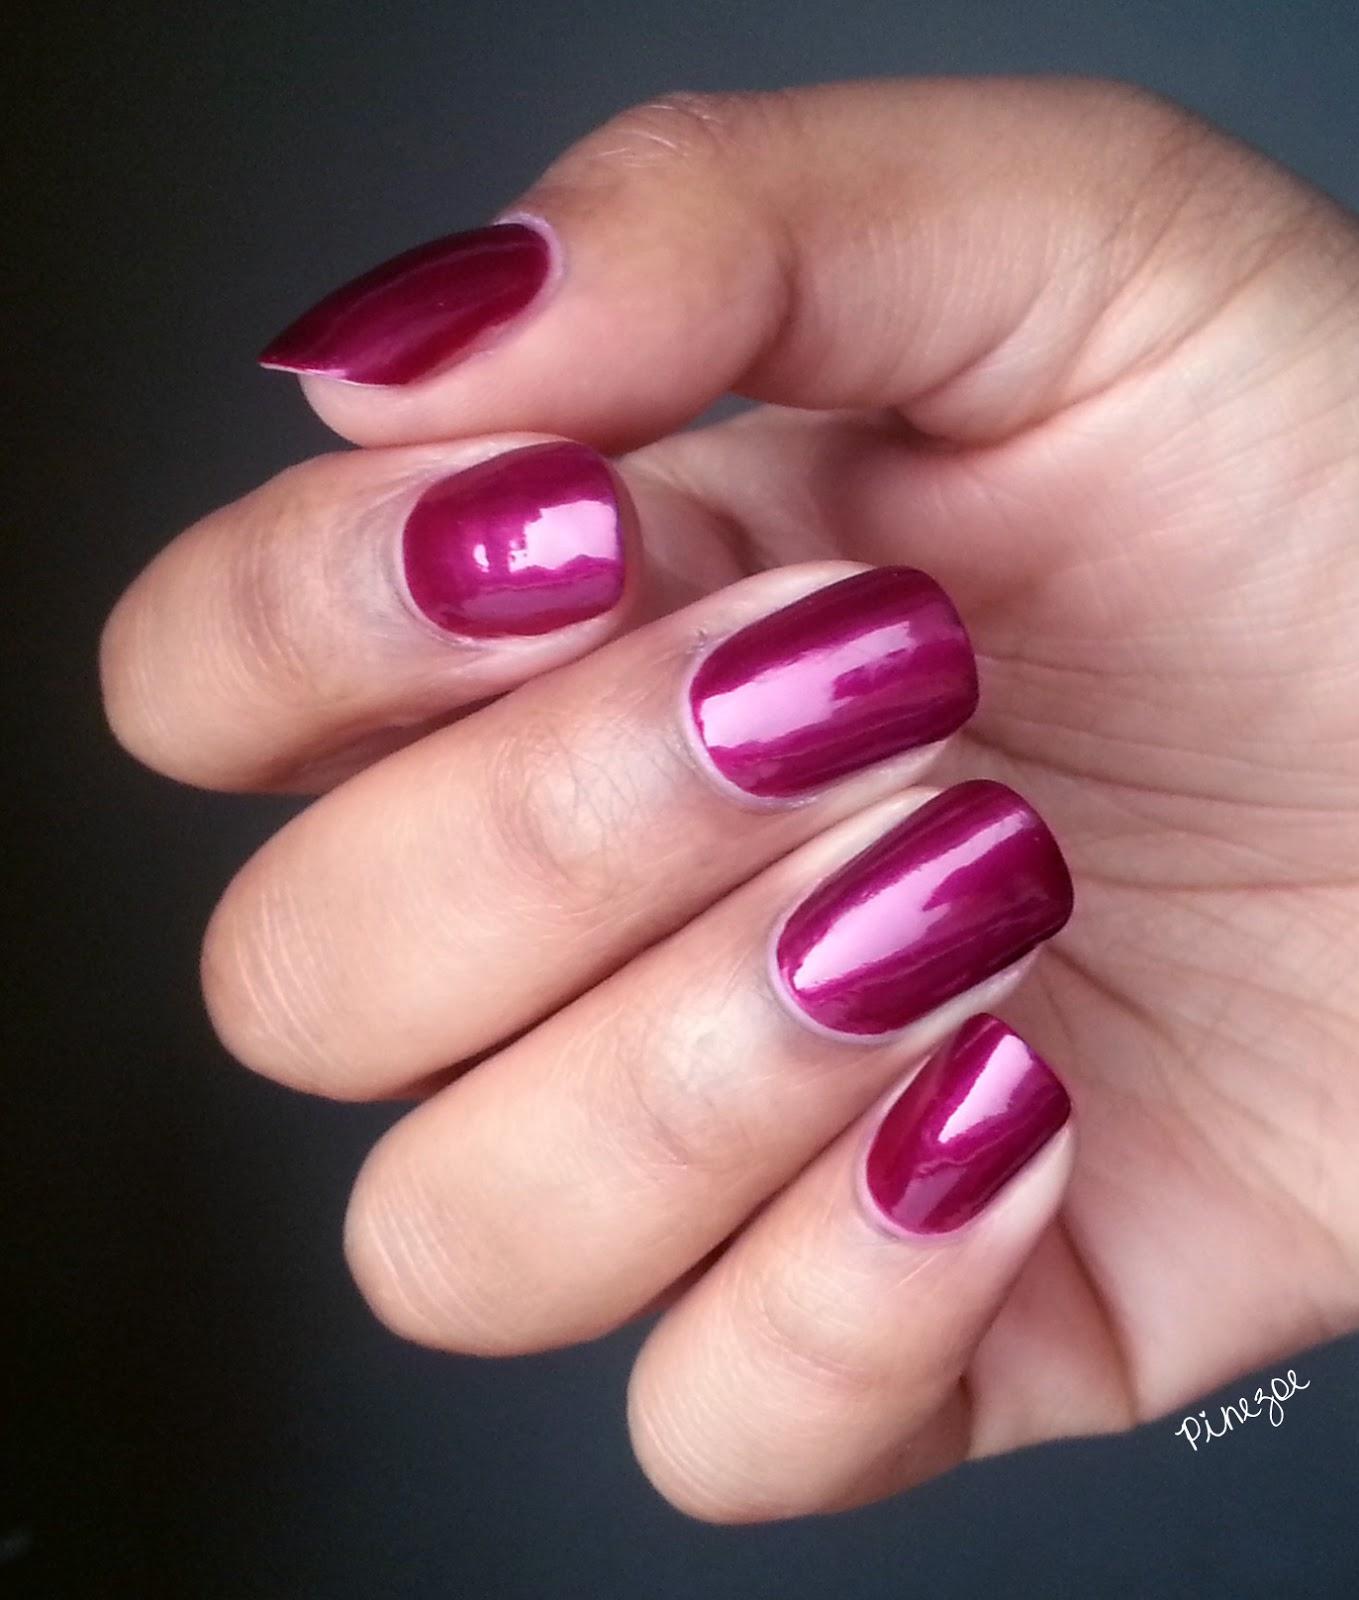 Kiko 495 - Pearly Vanda Burgundy